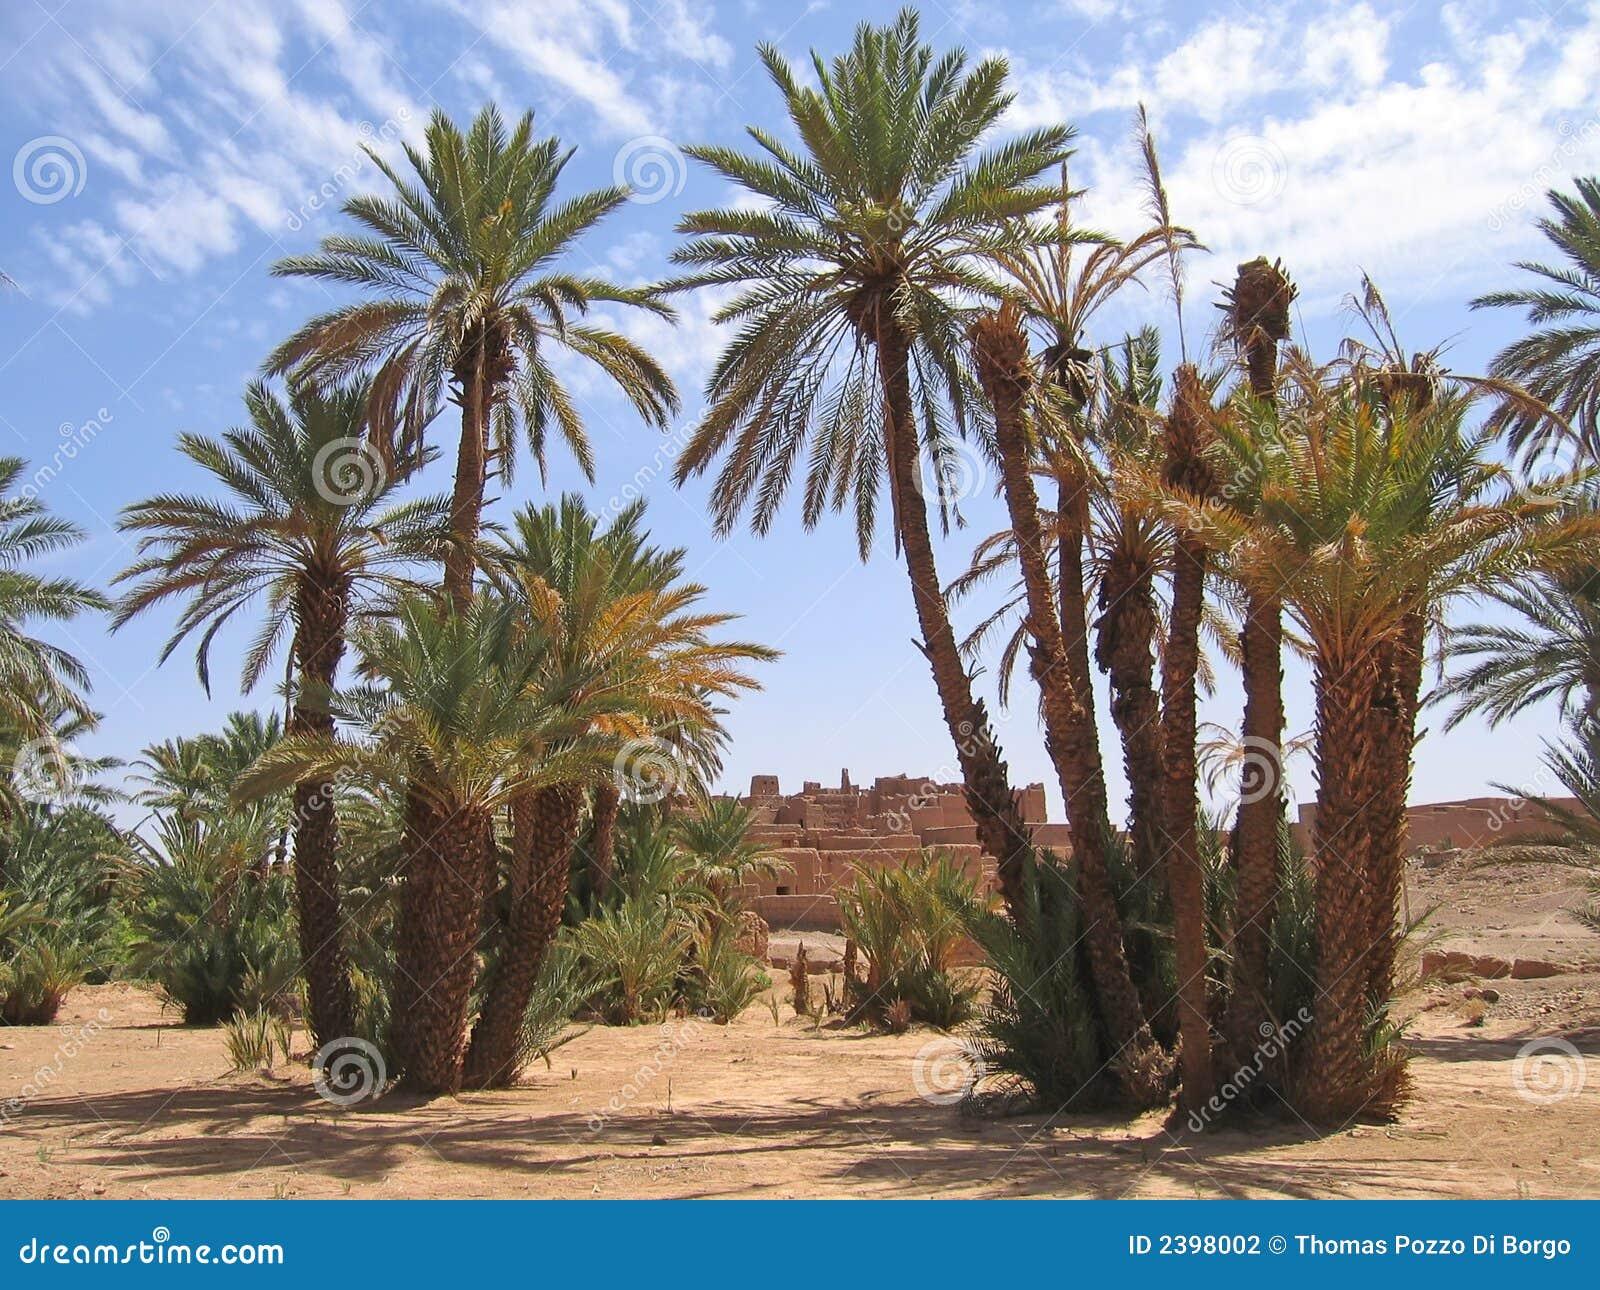 Palm Tree Desert Oasis Island